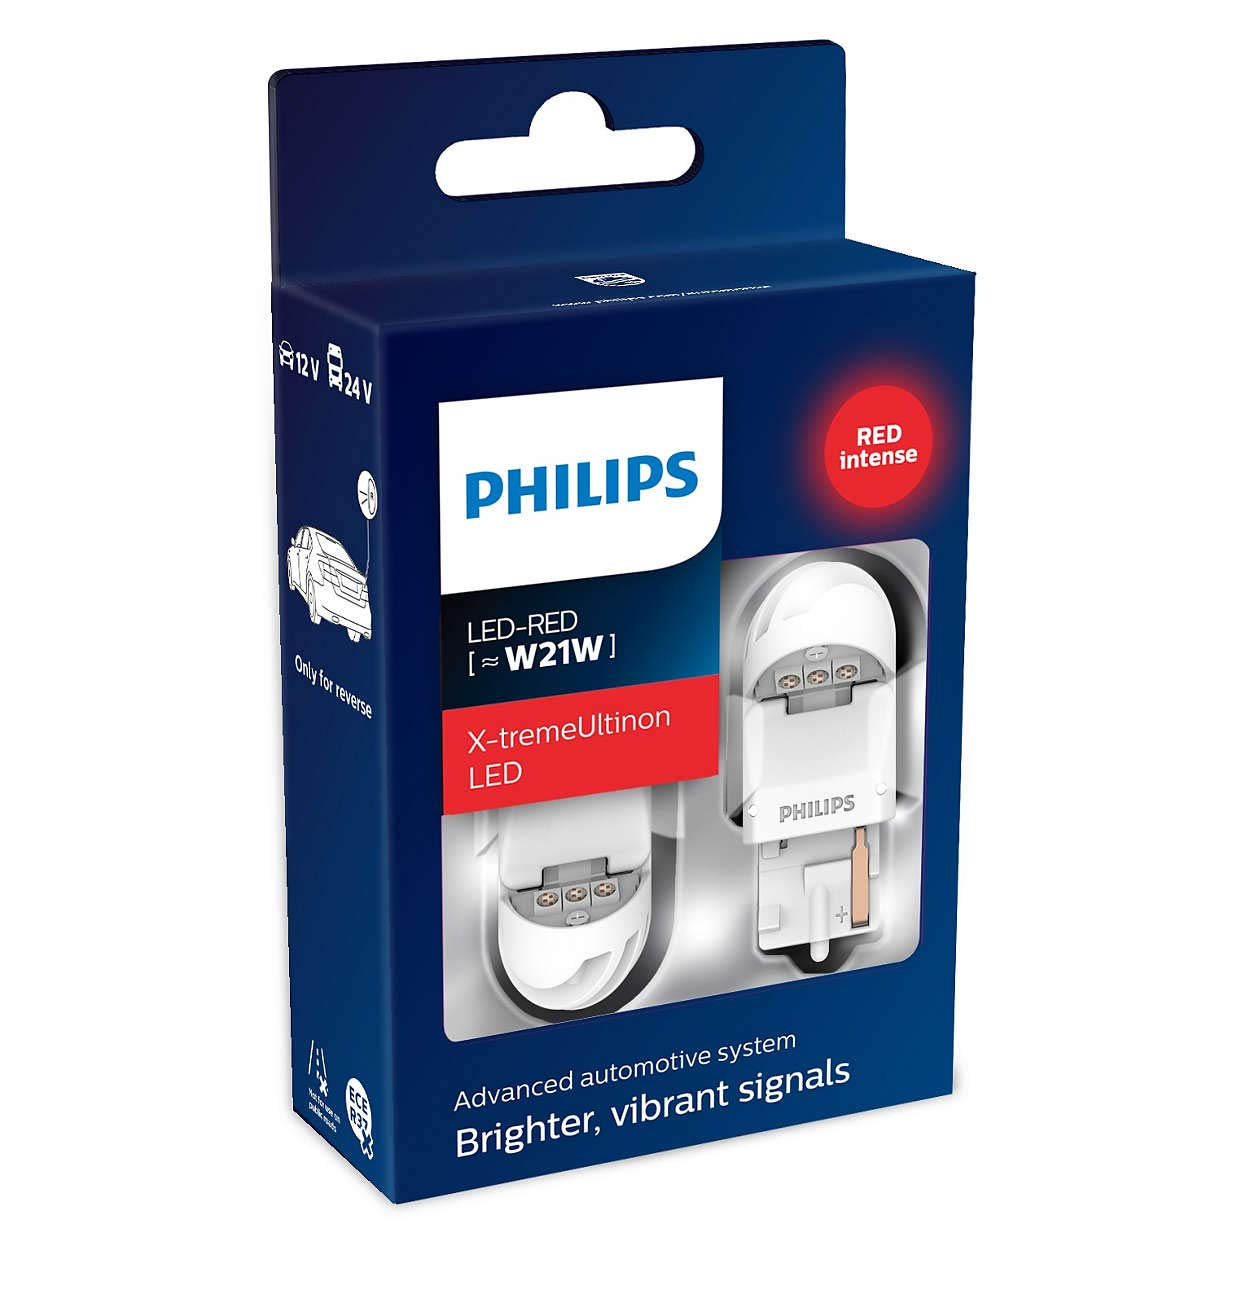 Philips automotive lighting 129416000KX1 X-tremeUltinon LED Luce per abitacolo C5W 30mm Festoon 6000K 12V 6000 Kelvin 1 Pezzo